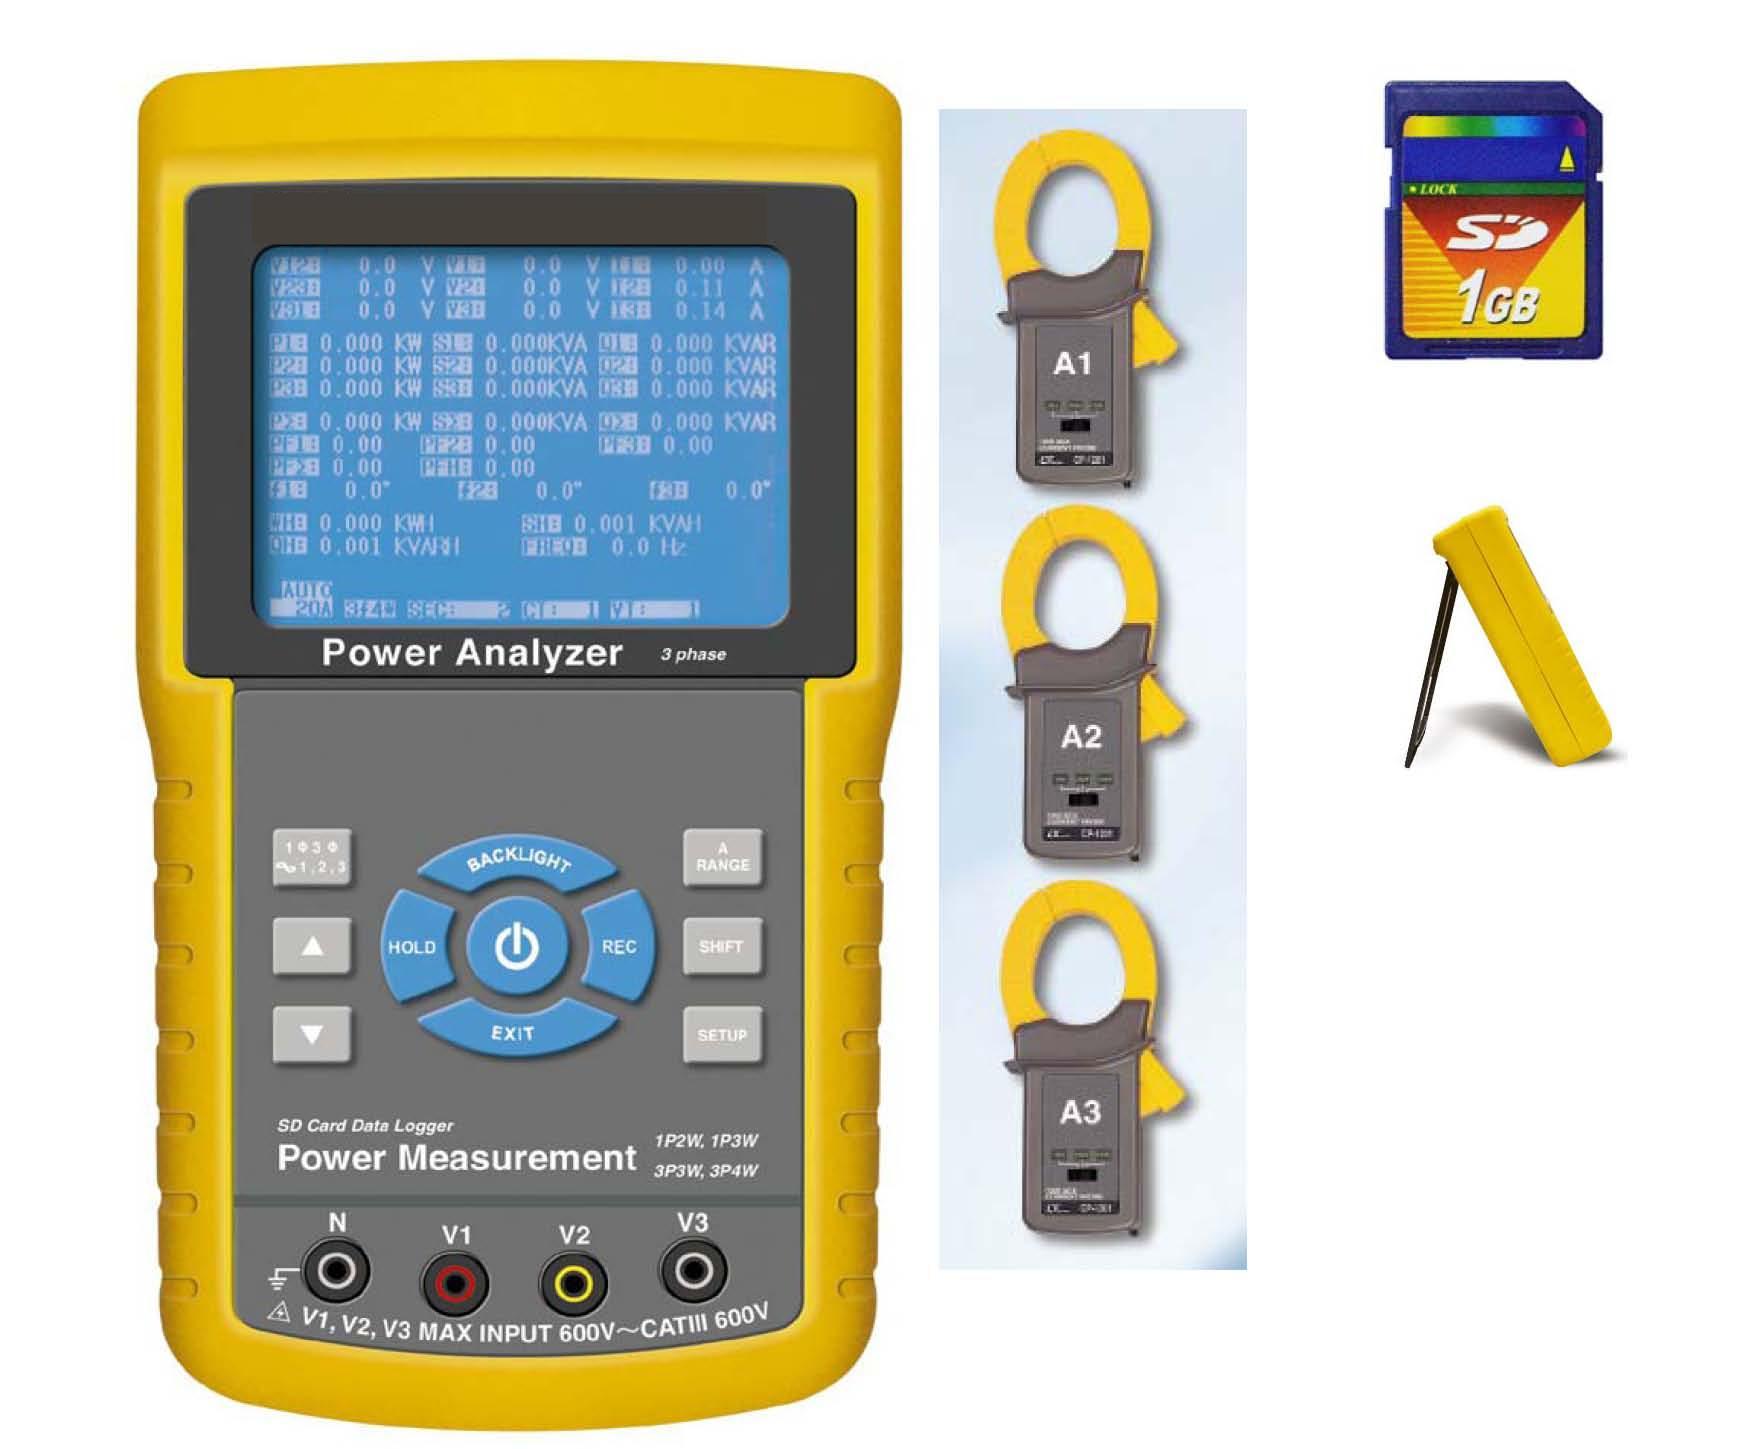 Digital Watt Meter Clamp : Digital watt meter dwm gives a direct reading of